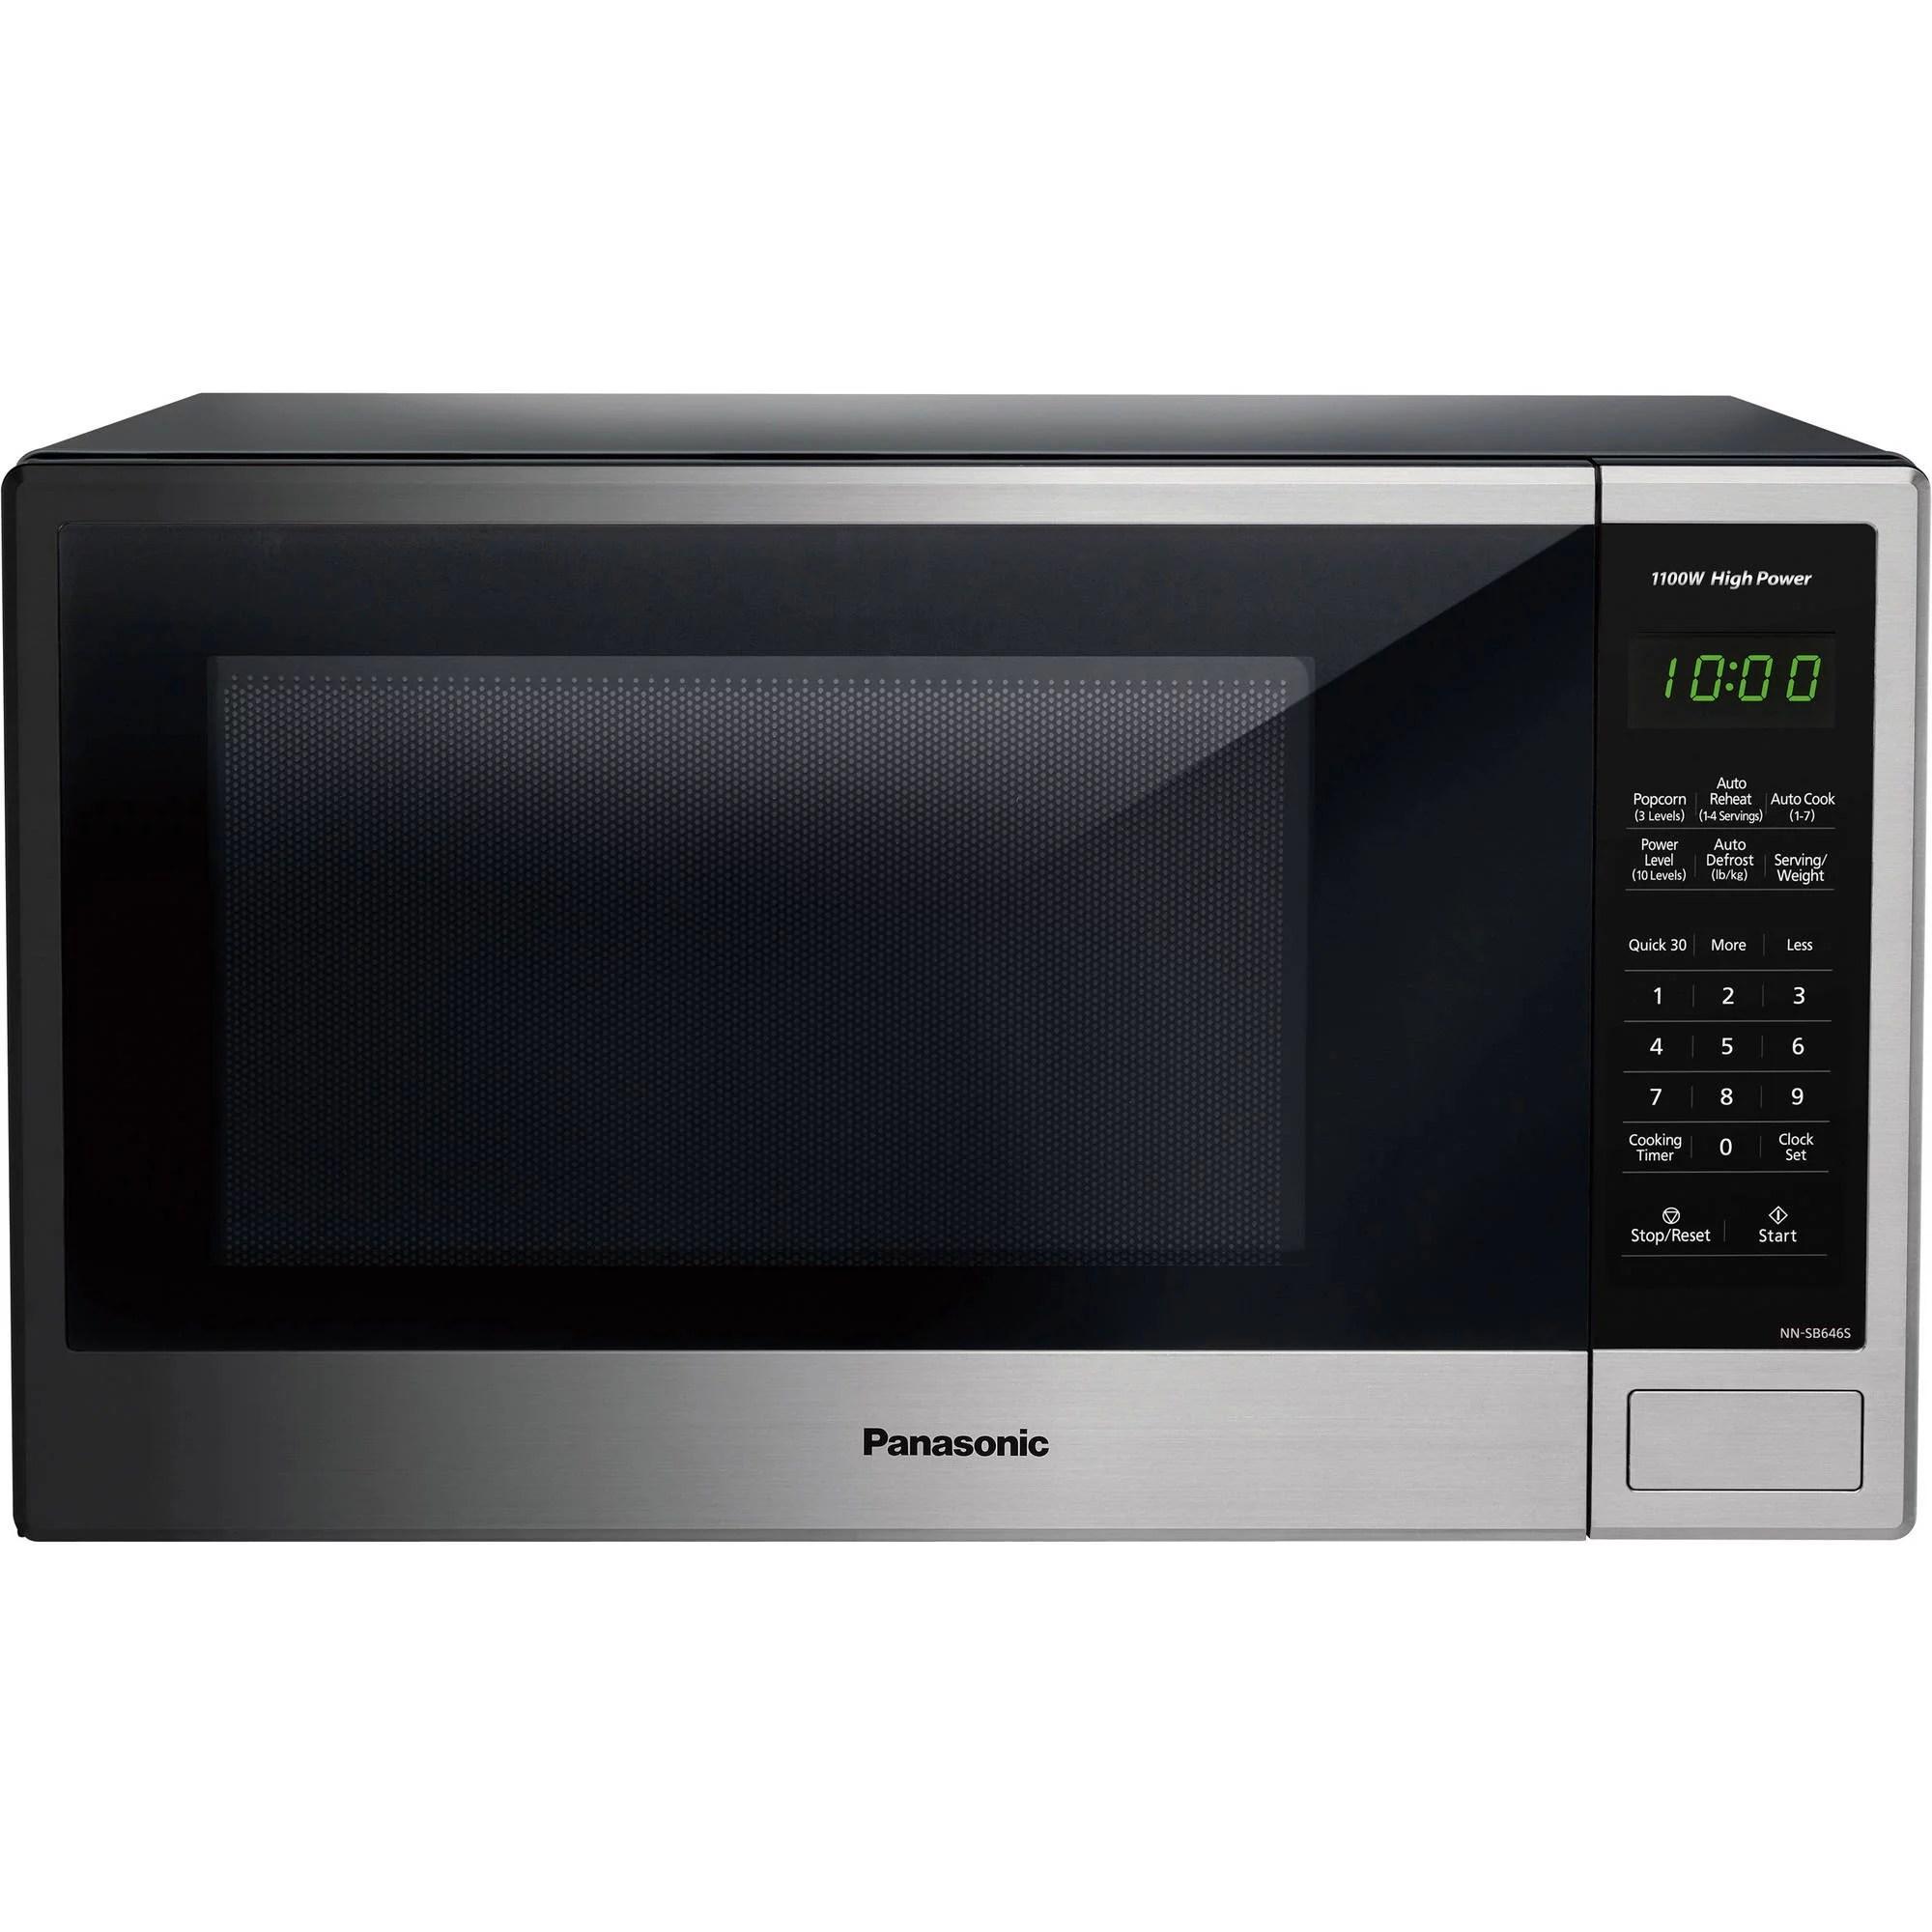 panasonic 1 3 cu ft 1100w countertop stainless steel microwave oven with genius sensor walmart com